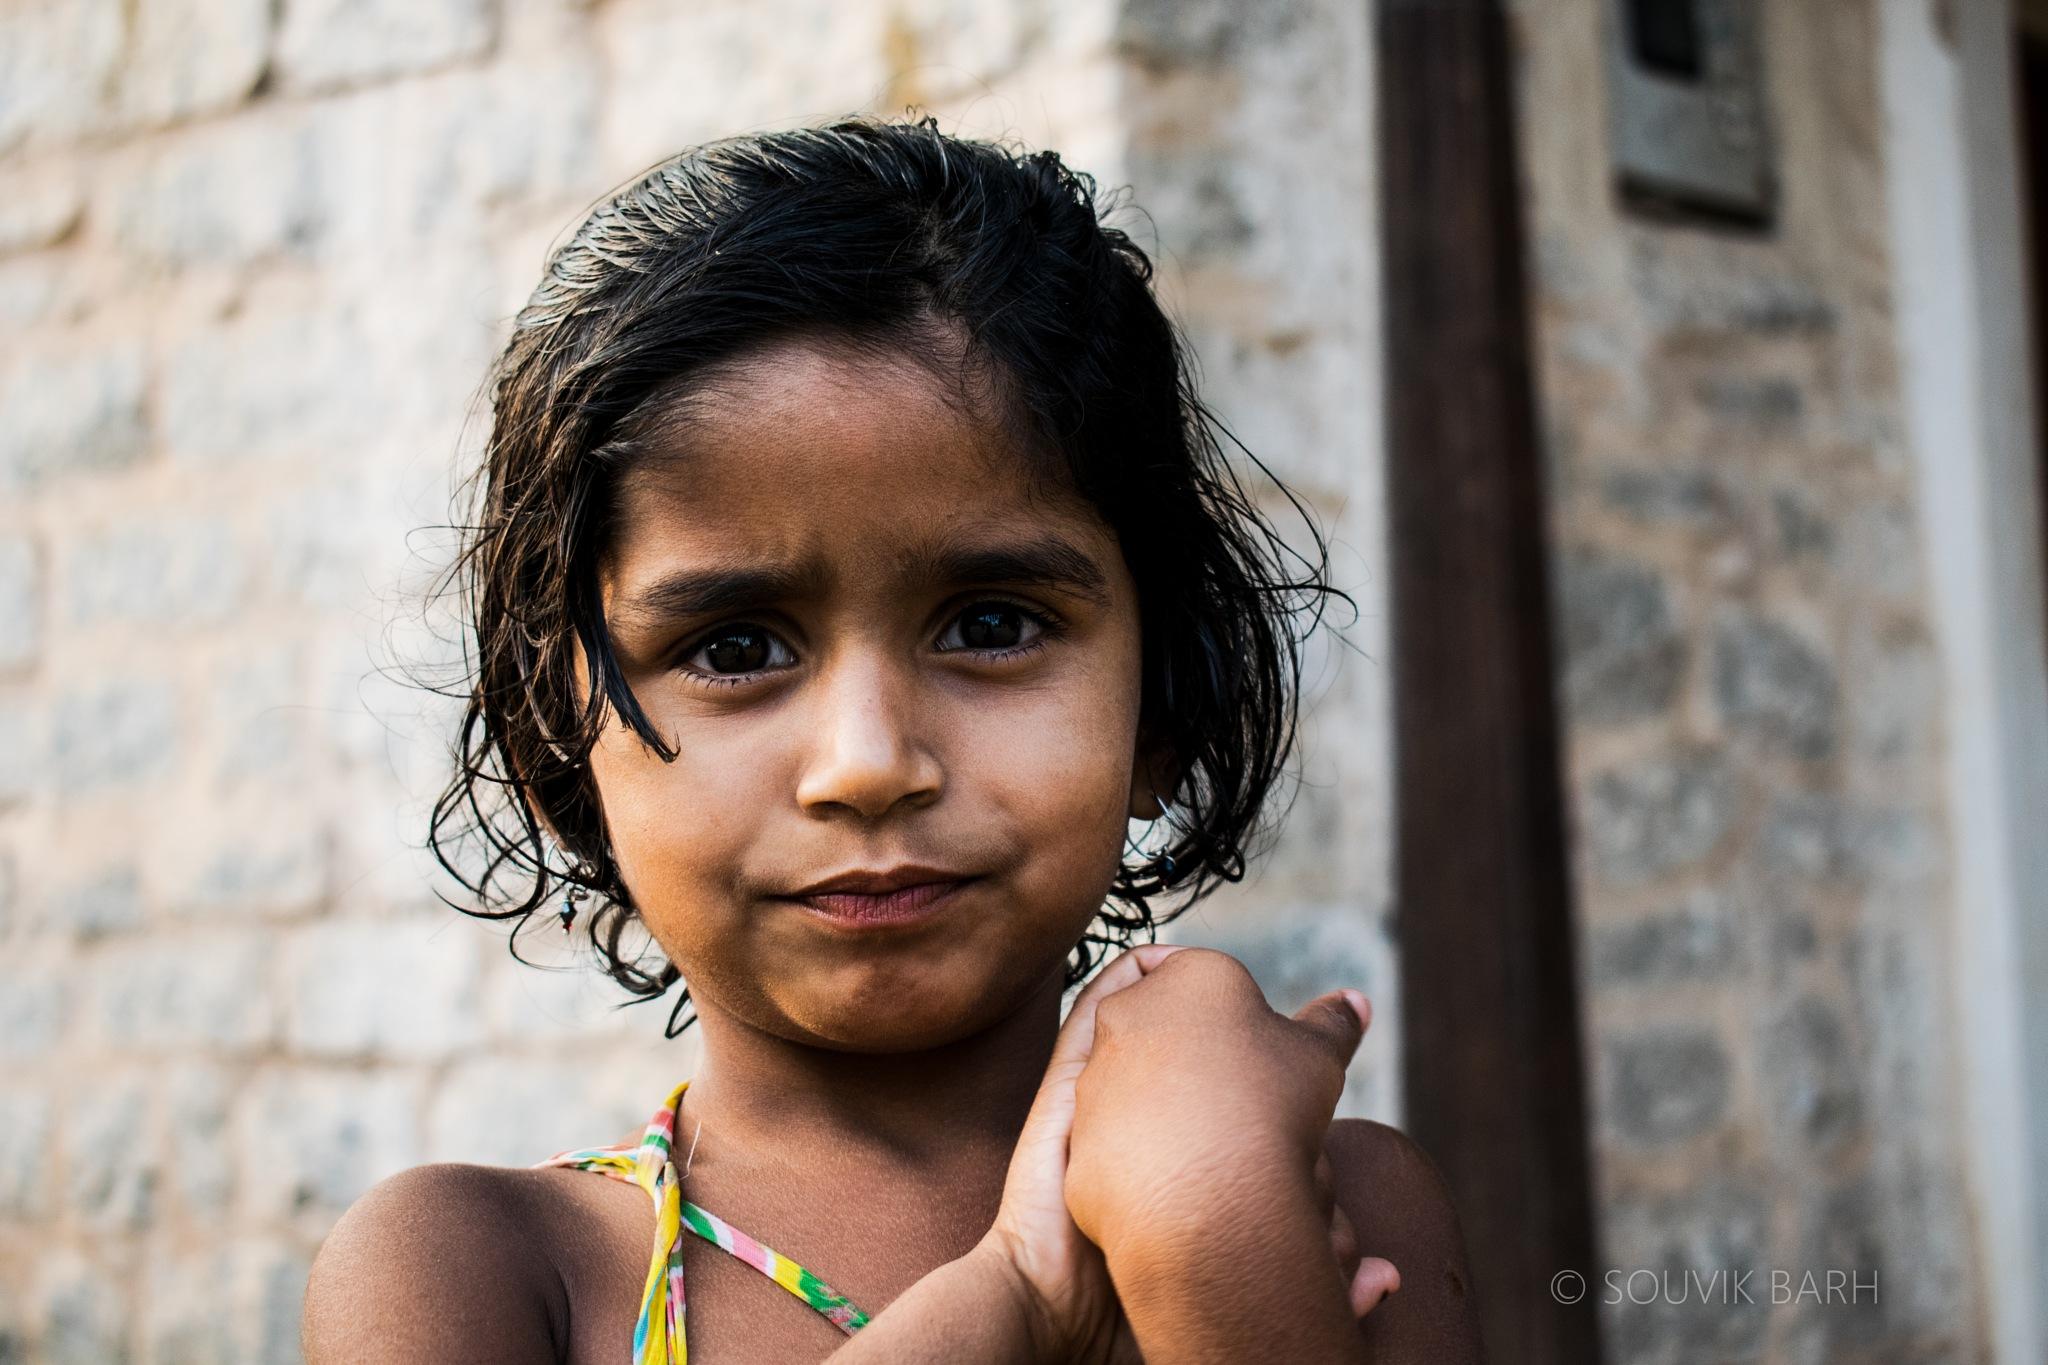 innocence  by Souvik Barh